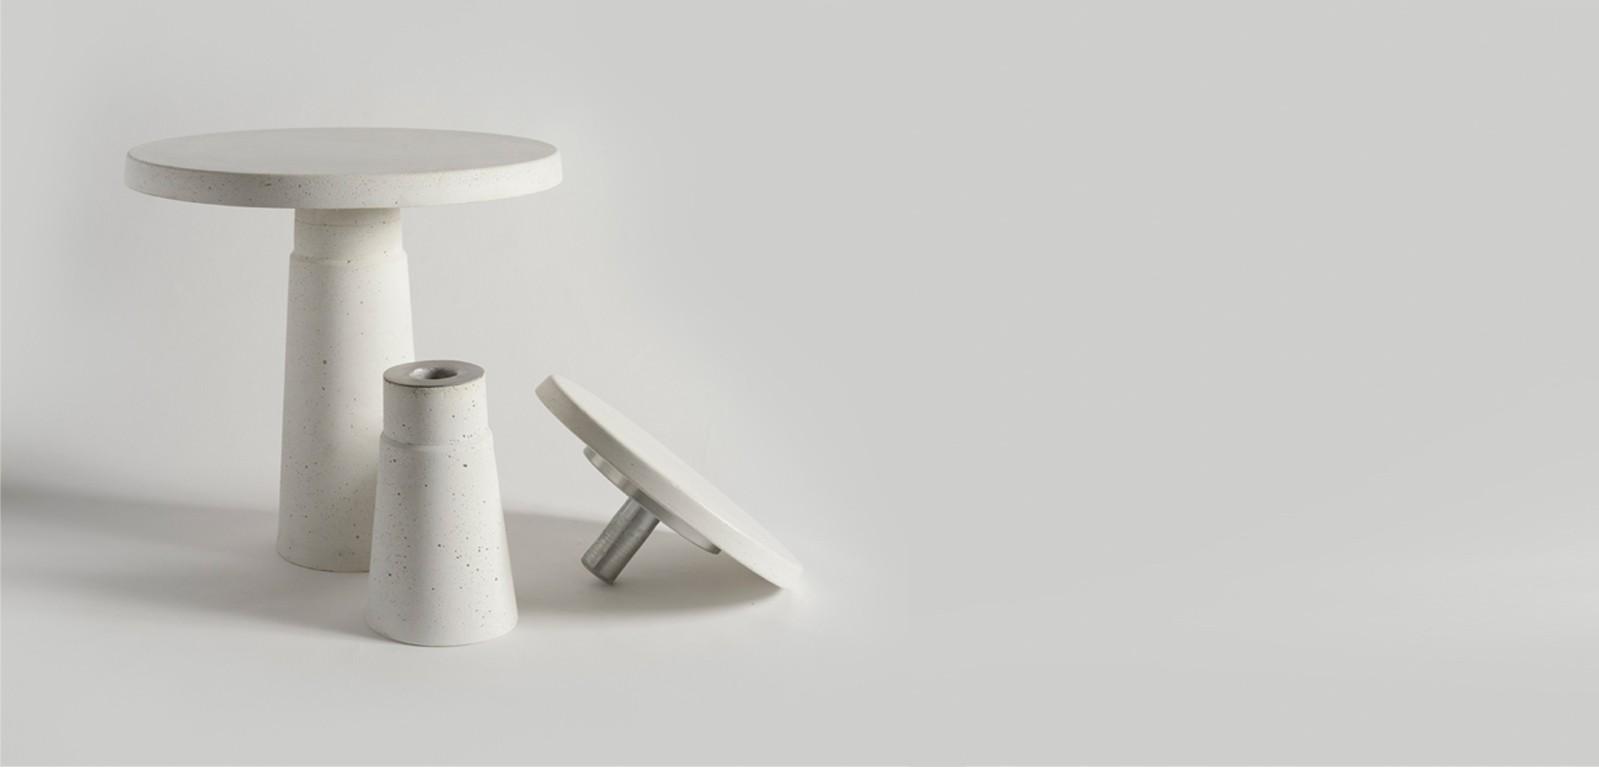 PIN-side-accent-coffee-tables-minimal-white-black-concrete-handmade-luxury-alentes